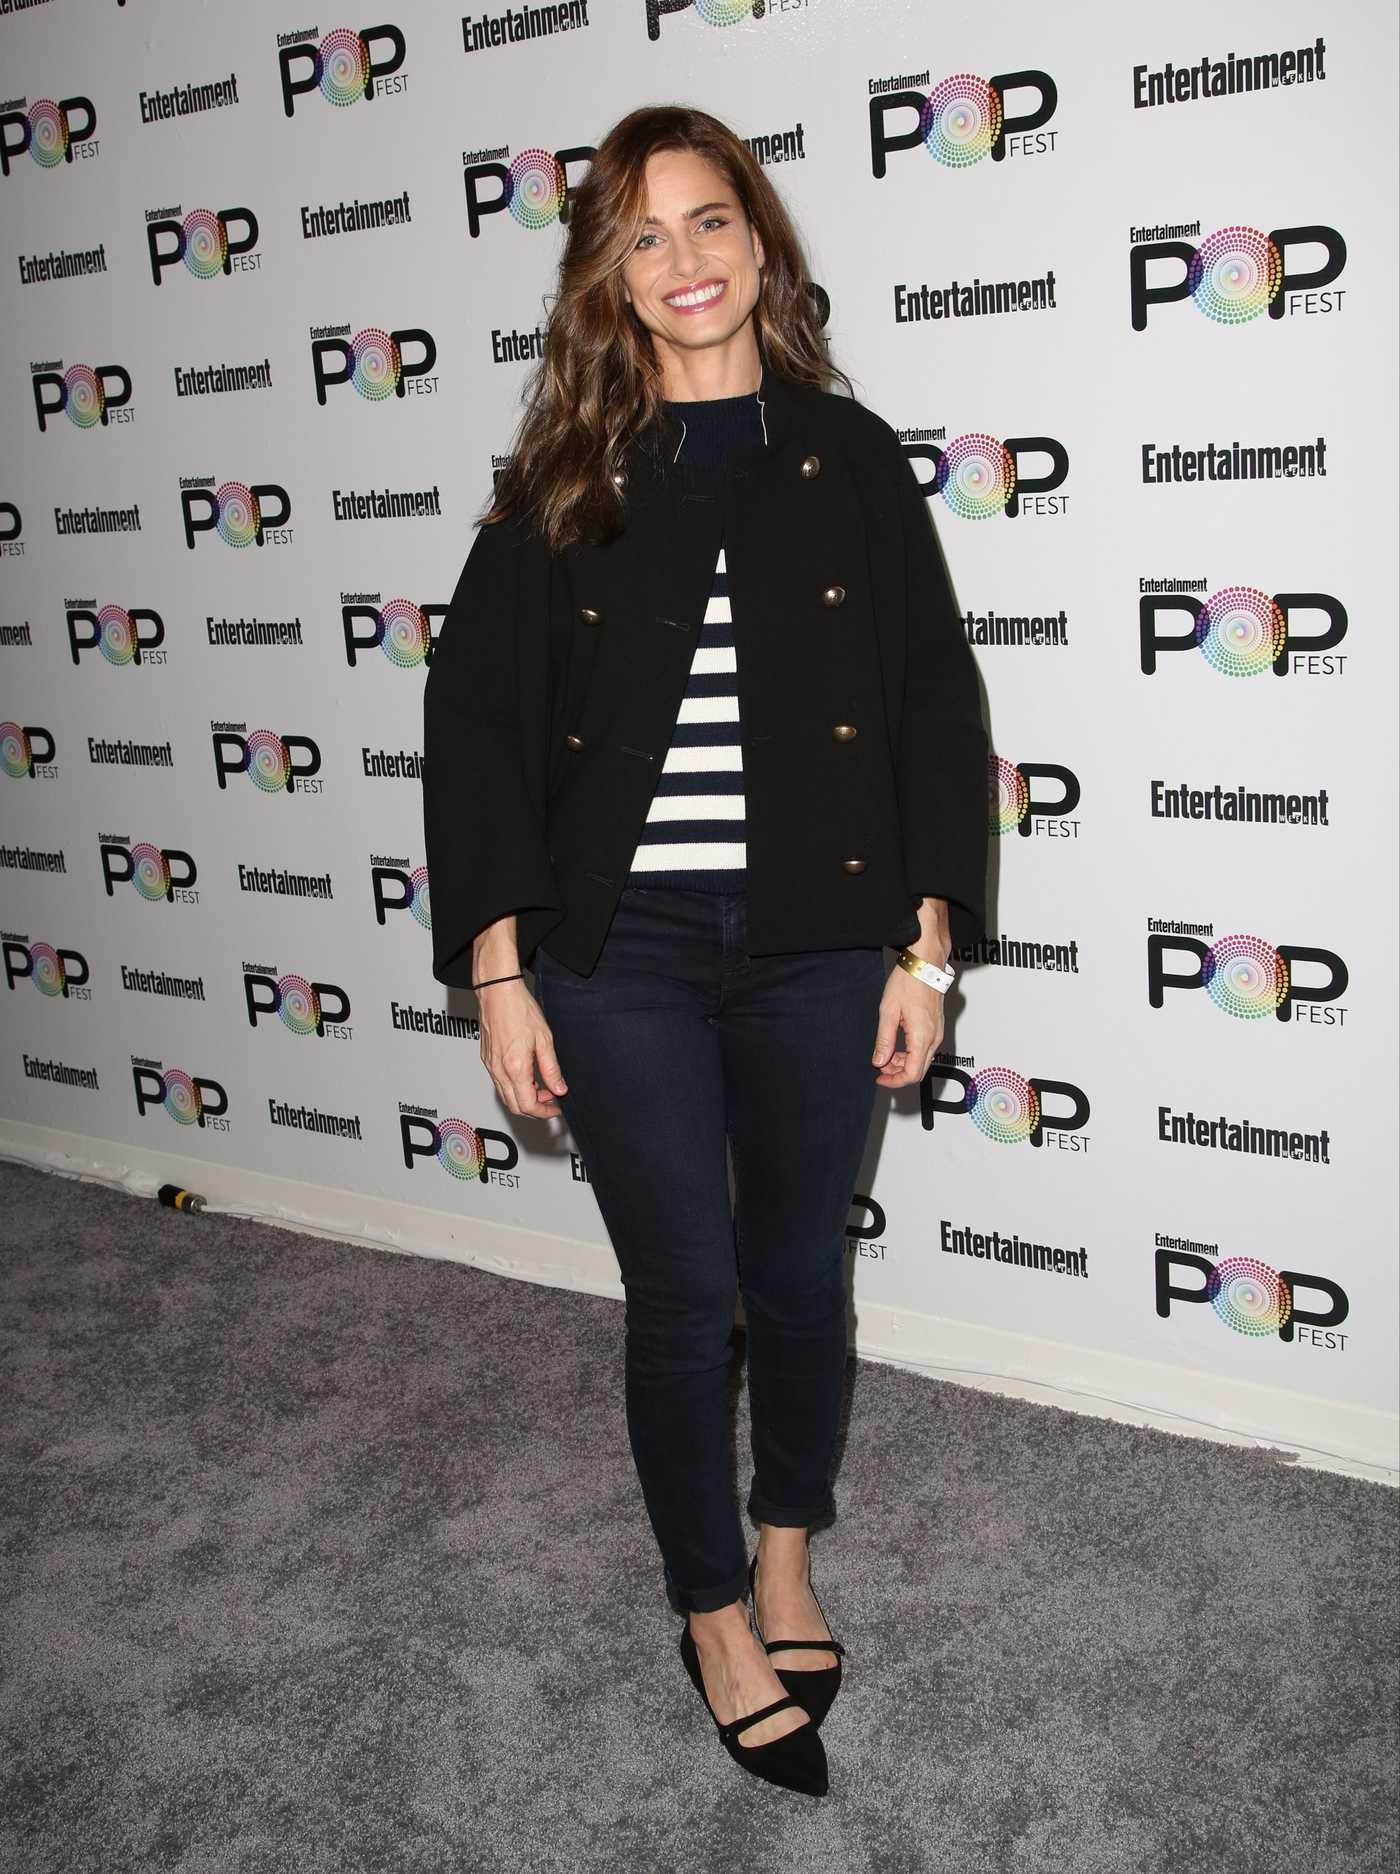 Amanda Peet at Entertainment Weekly's PopFest in Los Angeles 10/30/2016